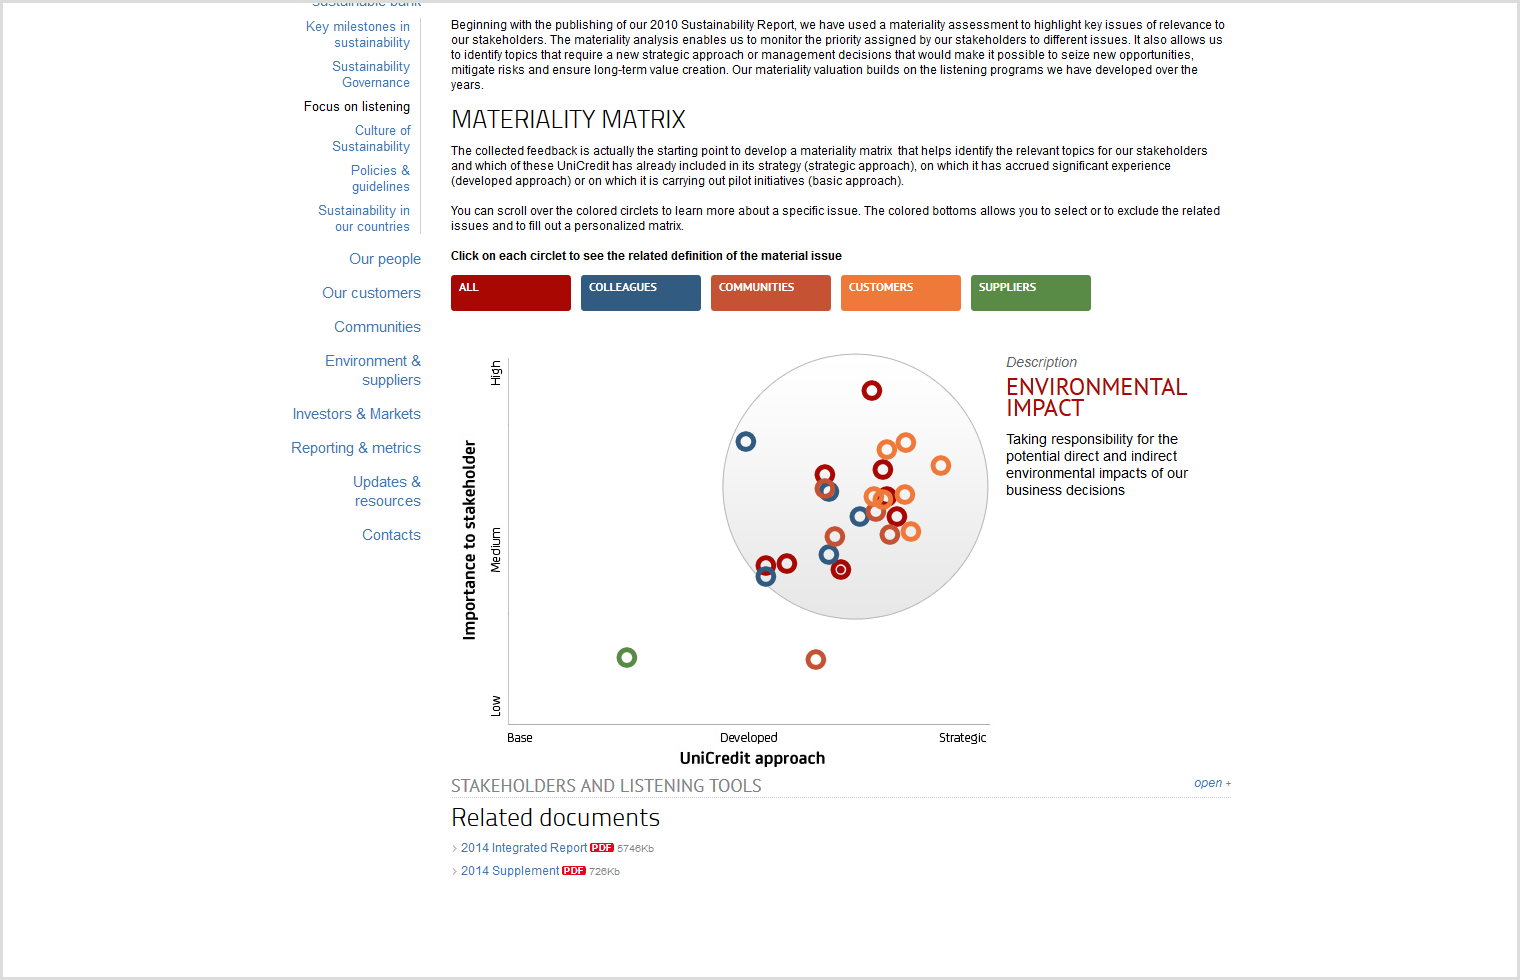 Interactive Materiality Matrix by UniCredit